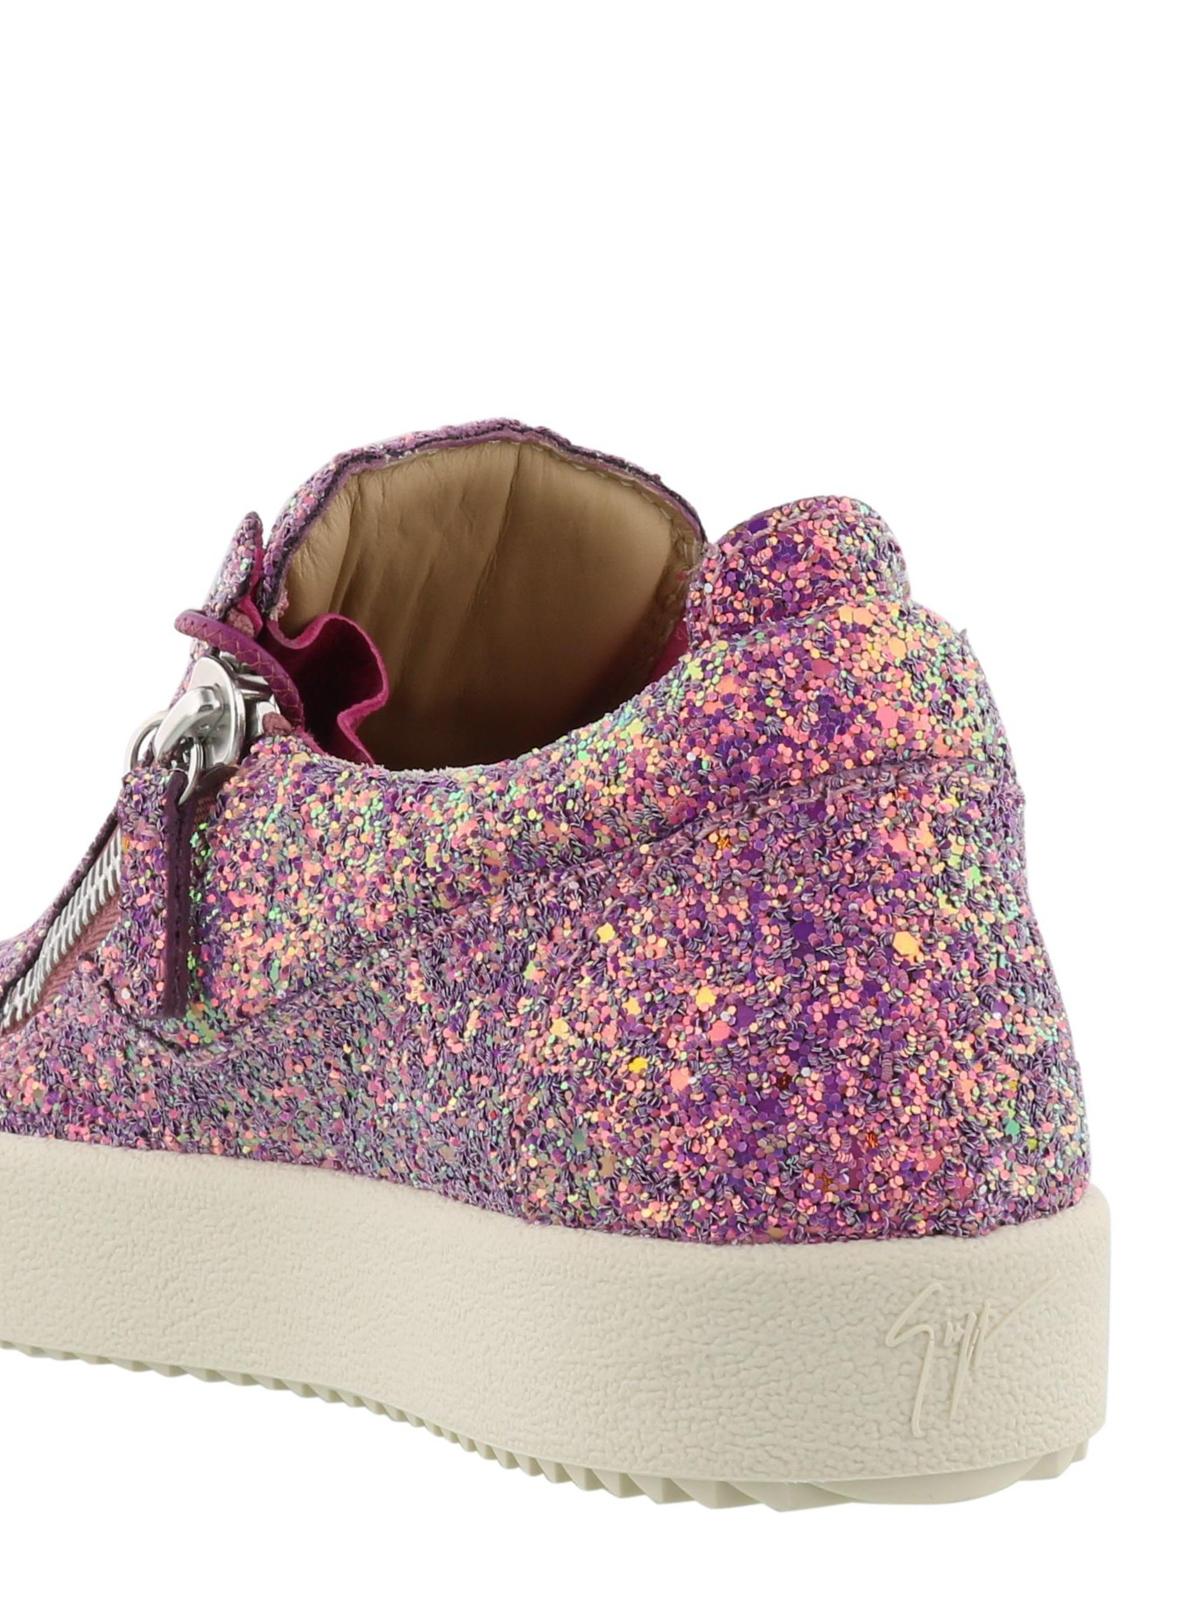 2e39613652be8 Giuseppe Zanotti - Cheryl Glitter purple sneakers - trainers ...